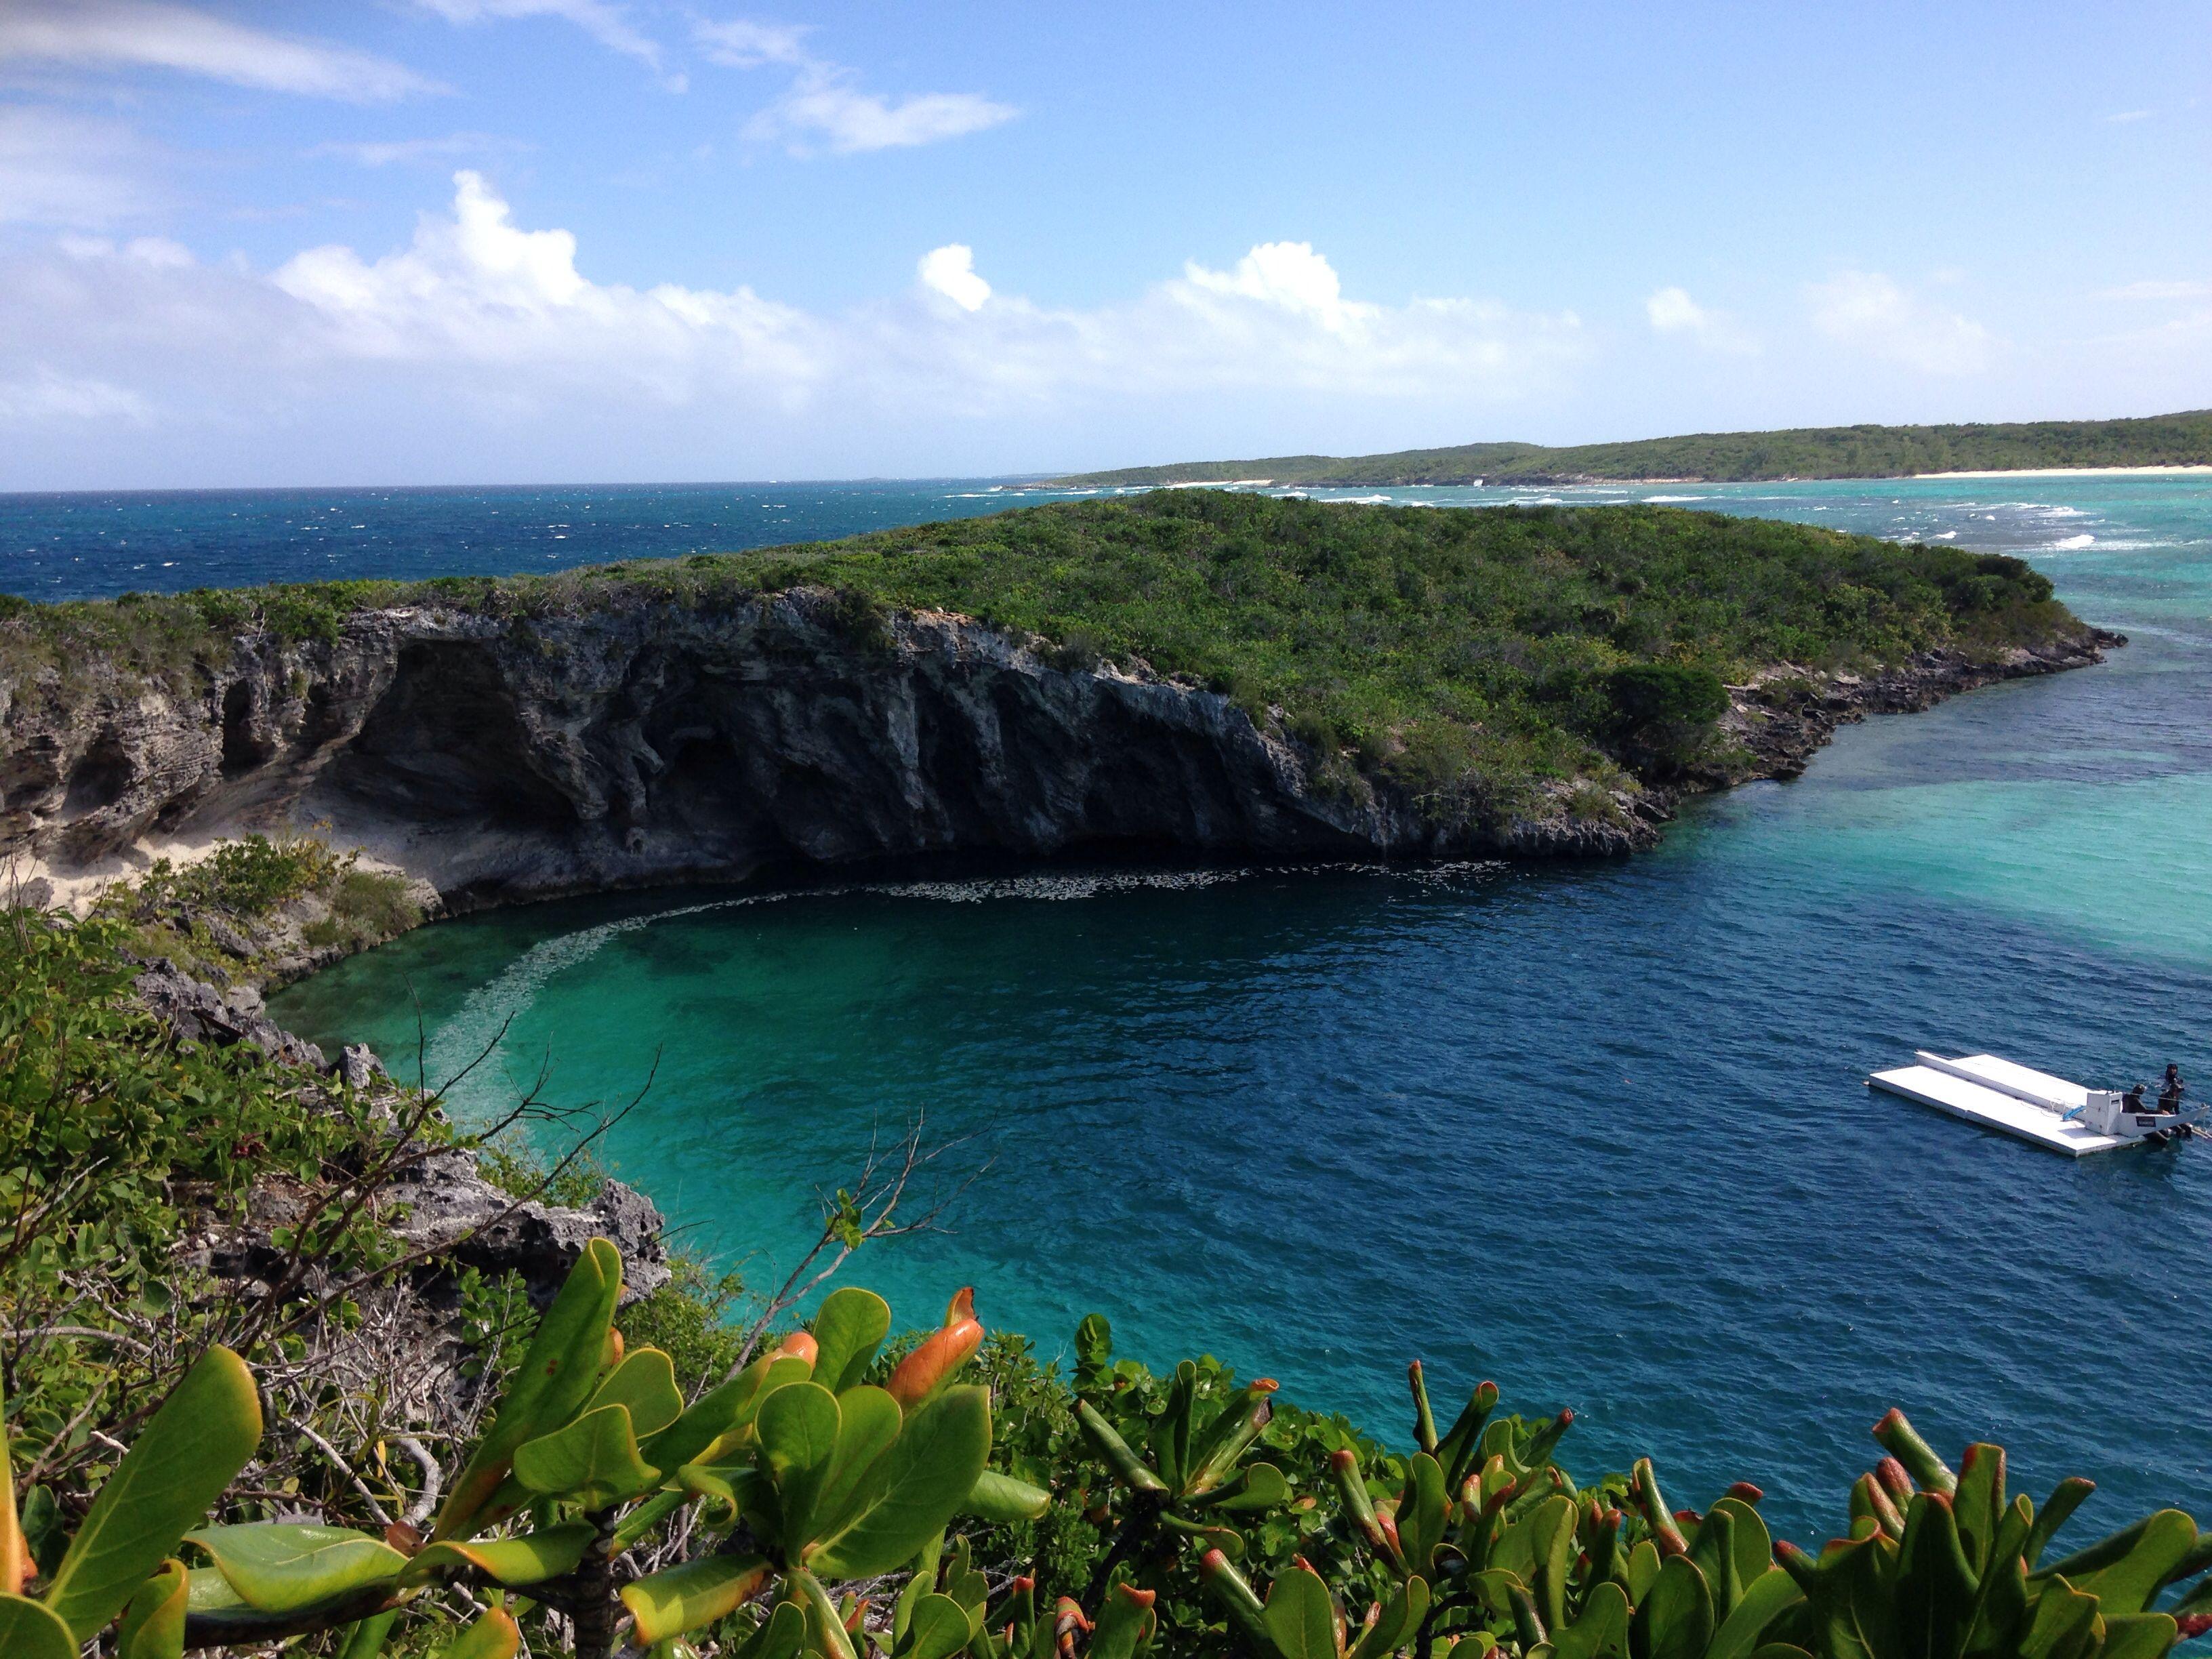 Deans Blue hole Long Island Bahamas